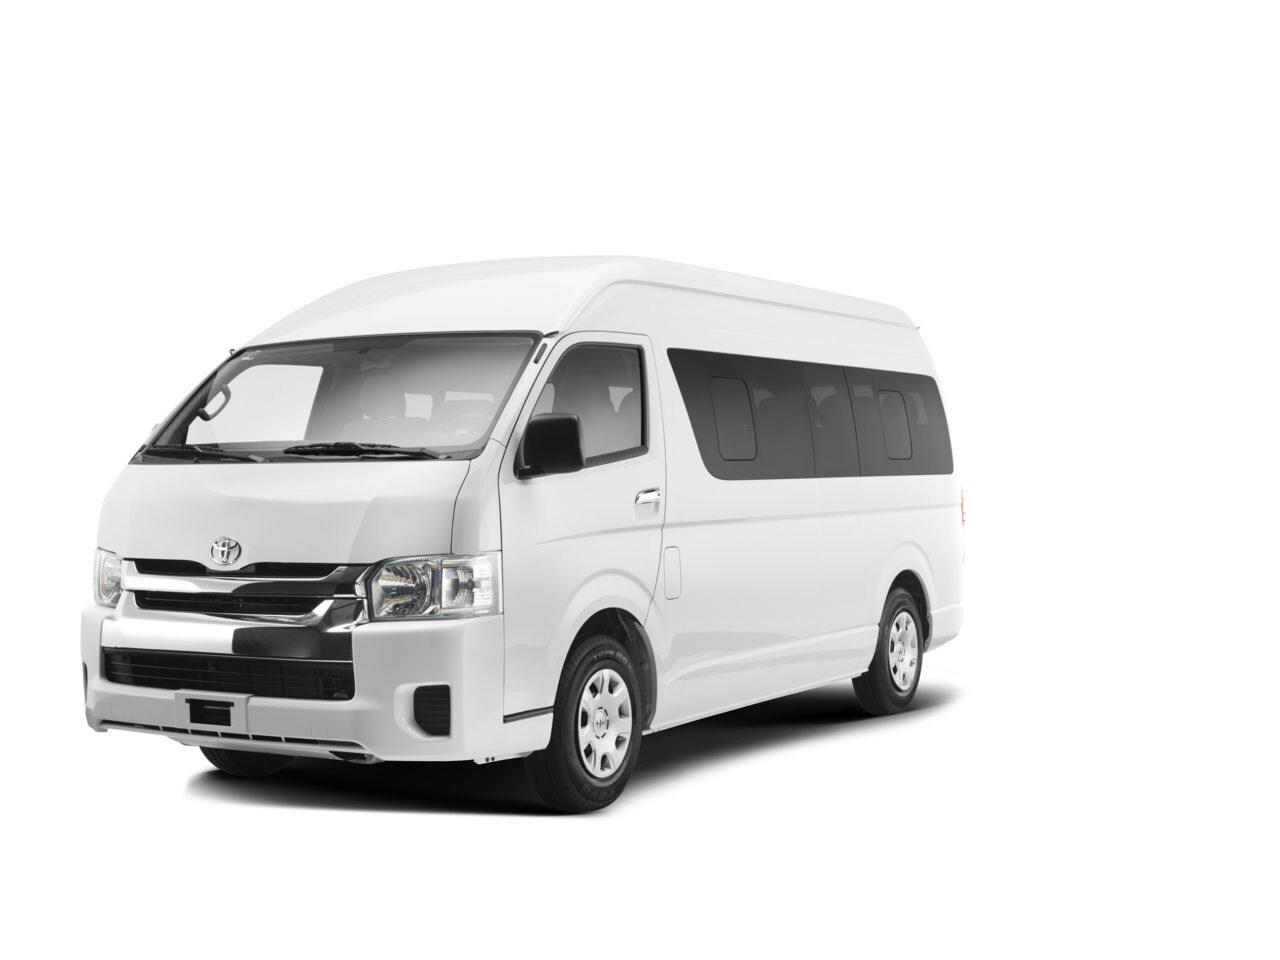 minivan para toyota hiace 2017 san nicol s de los garza n l. Black Bedroom Furniture Sets. Home Design Ideas